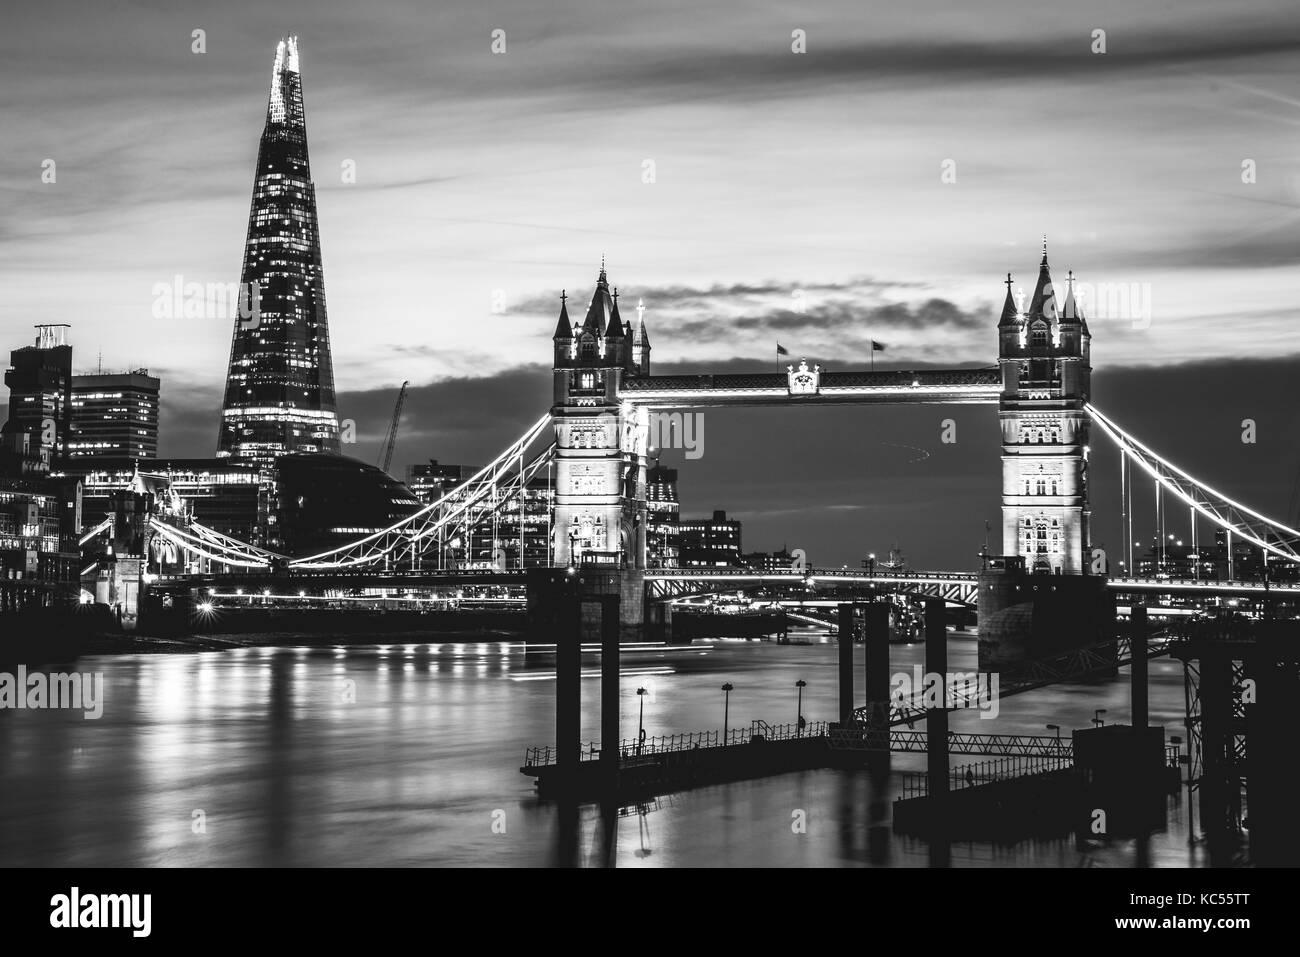 Themse, Tower Bridge, Shard, scena notturna, illuminato, vista acqua, Southwark, st katharine & Wapping, Londra, Immagini Stock